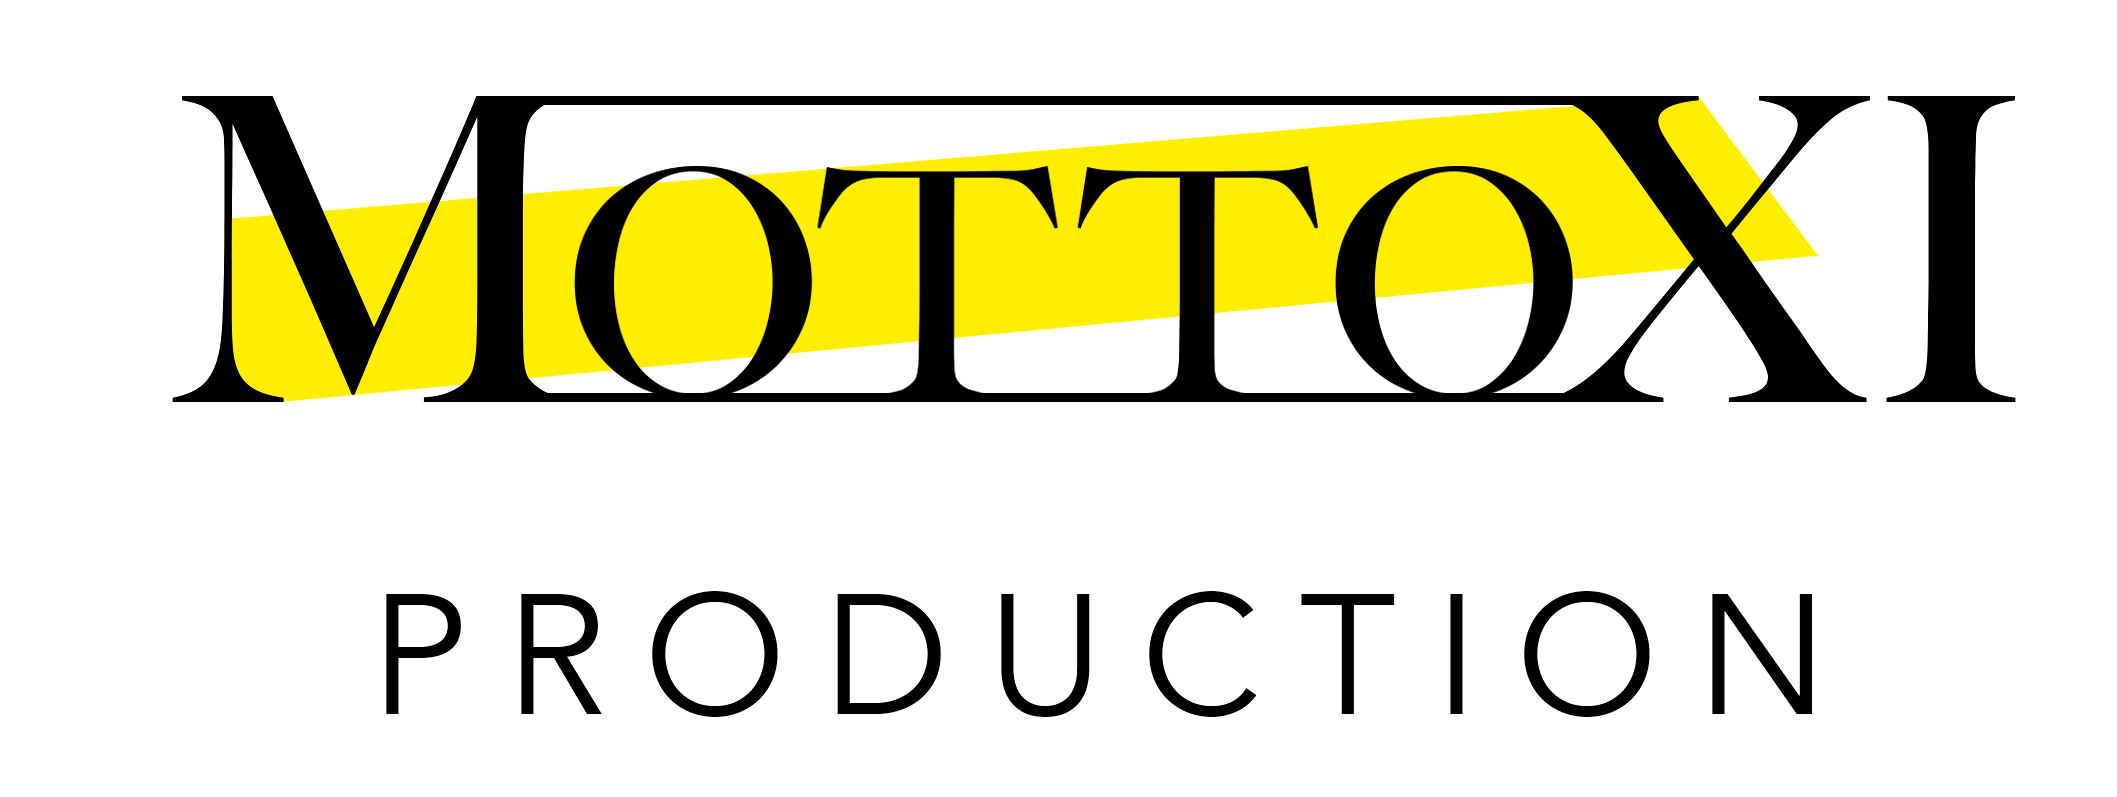 Motto11 Production banner fotograf